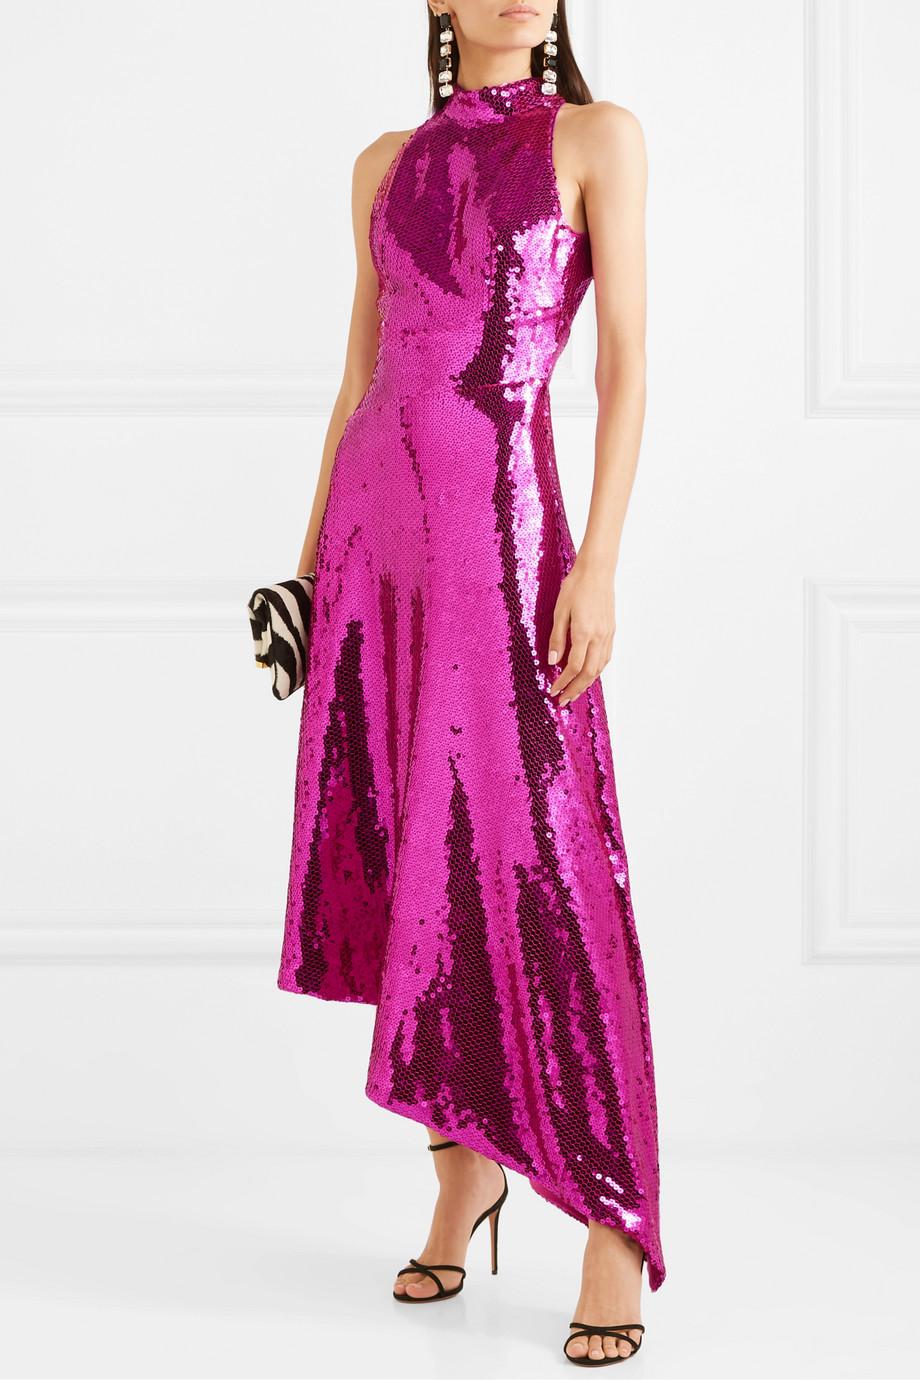 RASARIO 不对称露背亮片缎布中长连衣裙